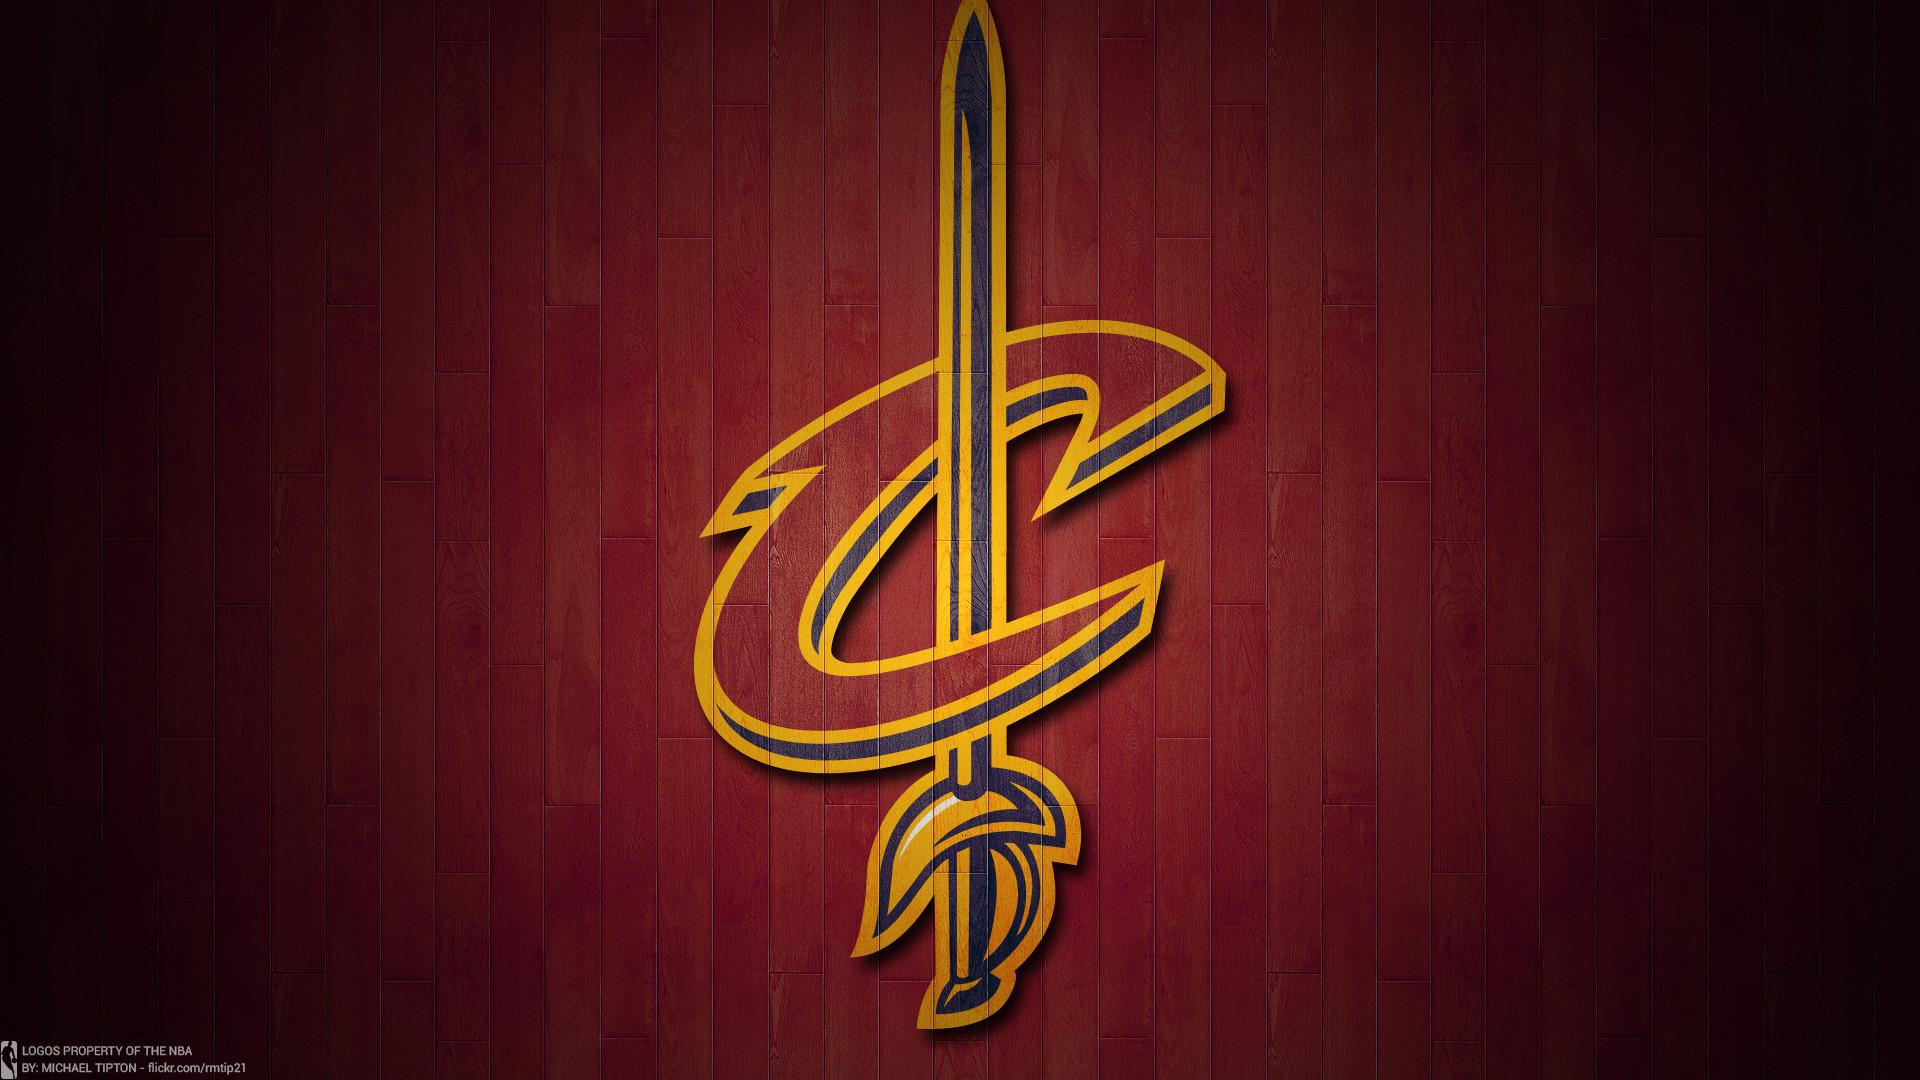 NBA 2017 Cleveland Cavaliers hardwood logo desktop wallpaper